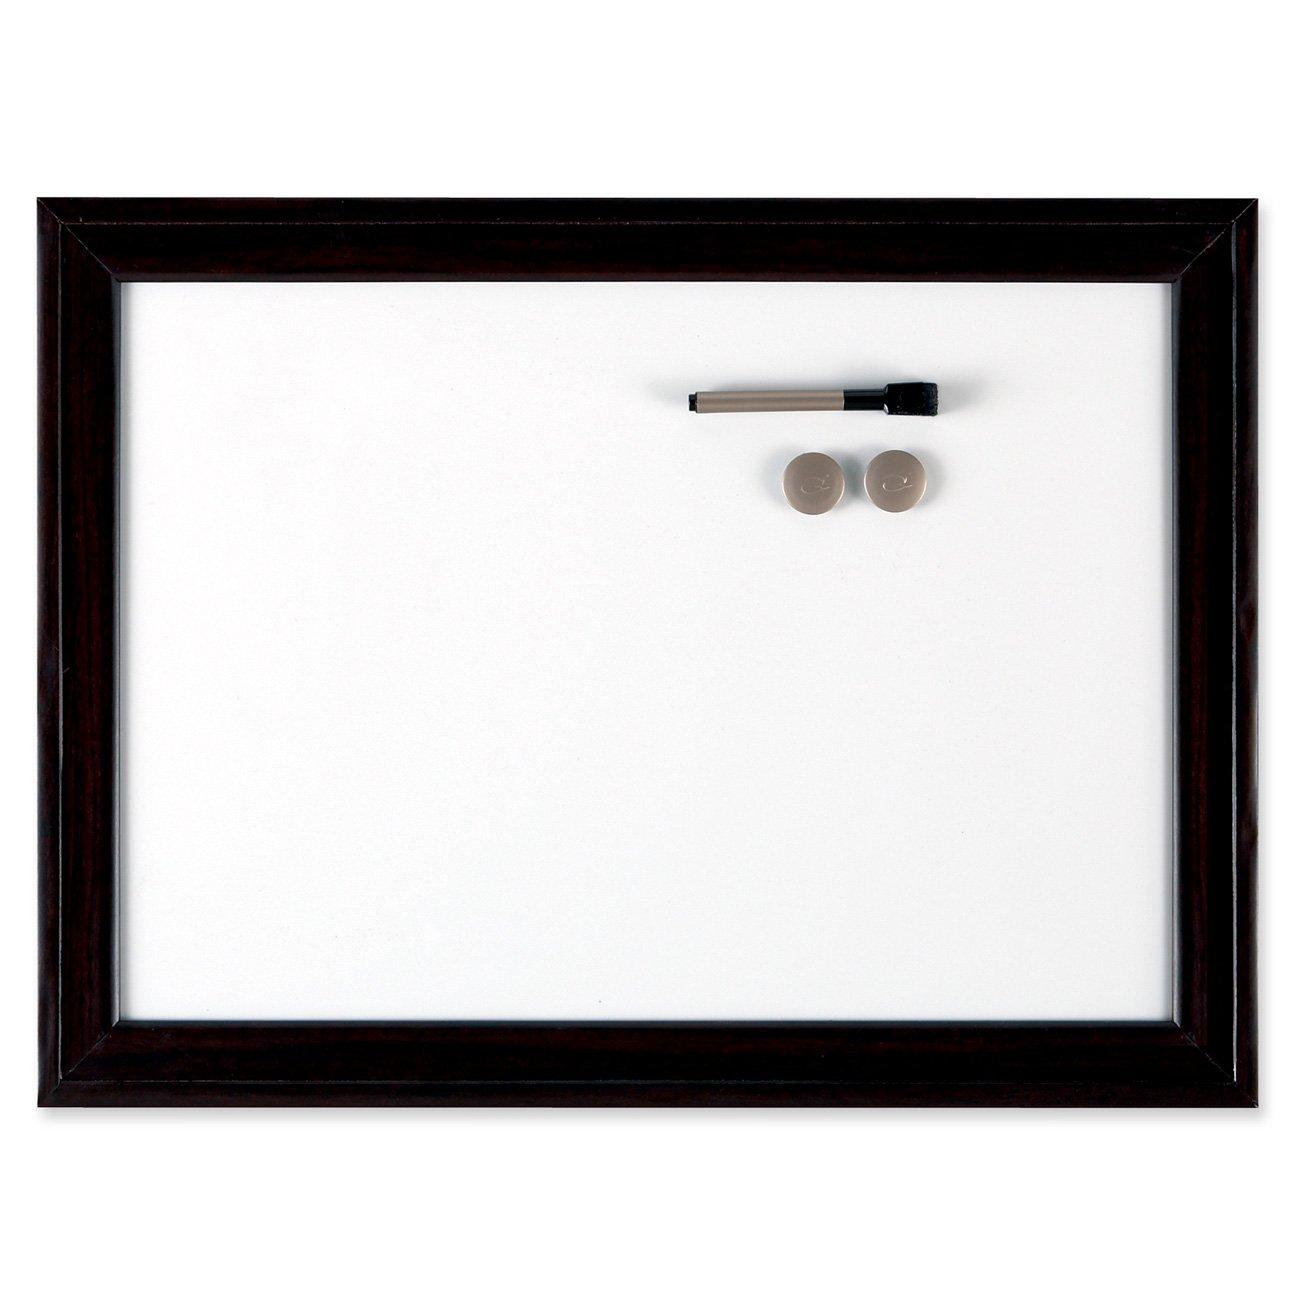 Quartet Espresso Home Decor Magnetic Dry-Erase Board, Wood Frame, 11 x 17 Inches (HDW1117B)